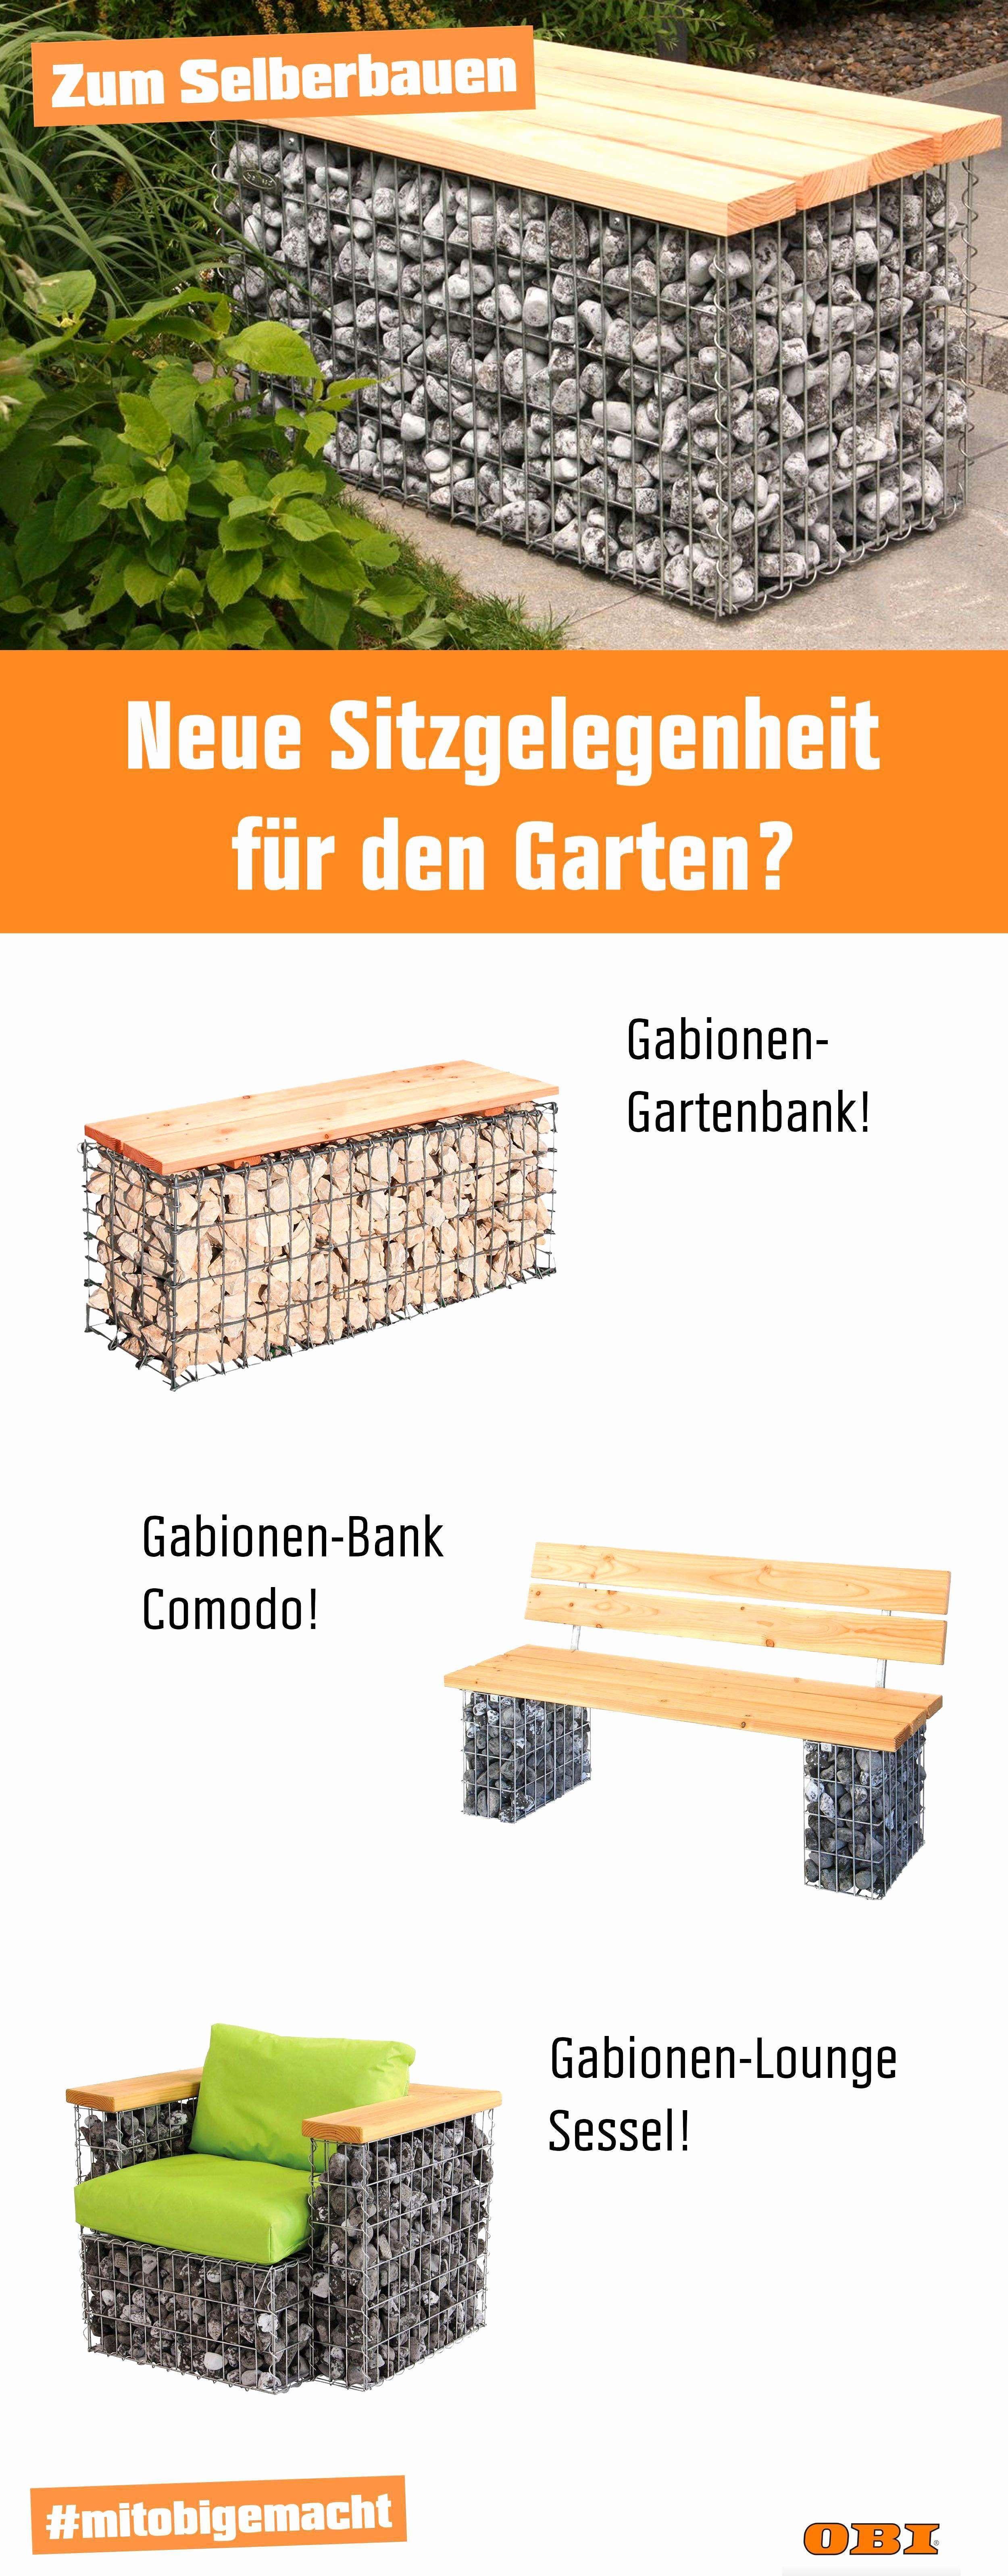 Design 43 Zum Gartenmobel Ausverkauf Hornbach Check More At Https Www Estadoproperties Com Garten Feuerstelle Selber Bauen Feuerstelle Garten Sitzbank Garten